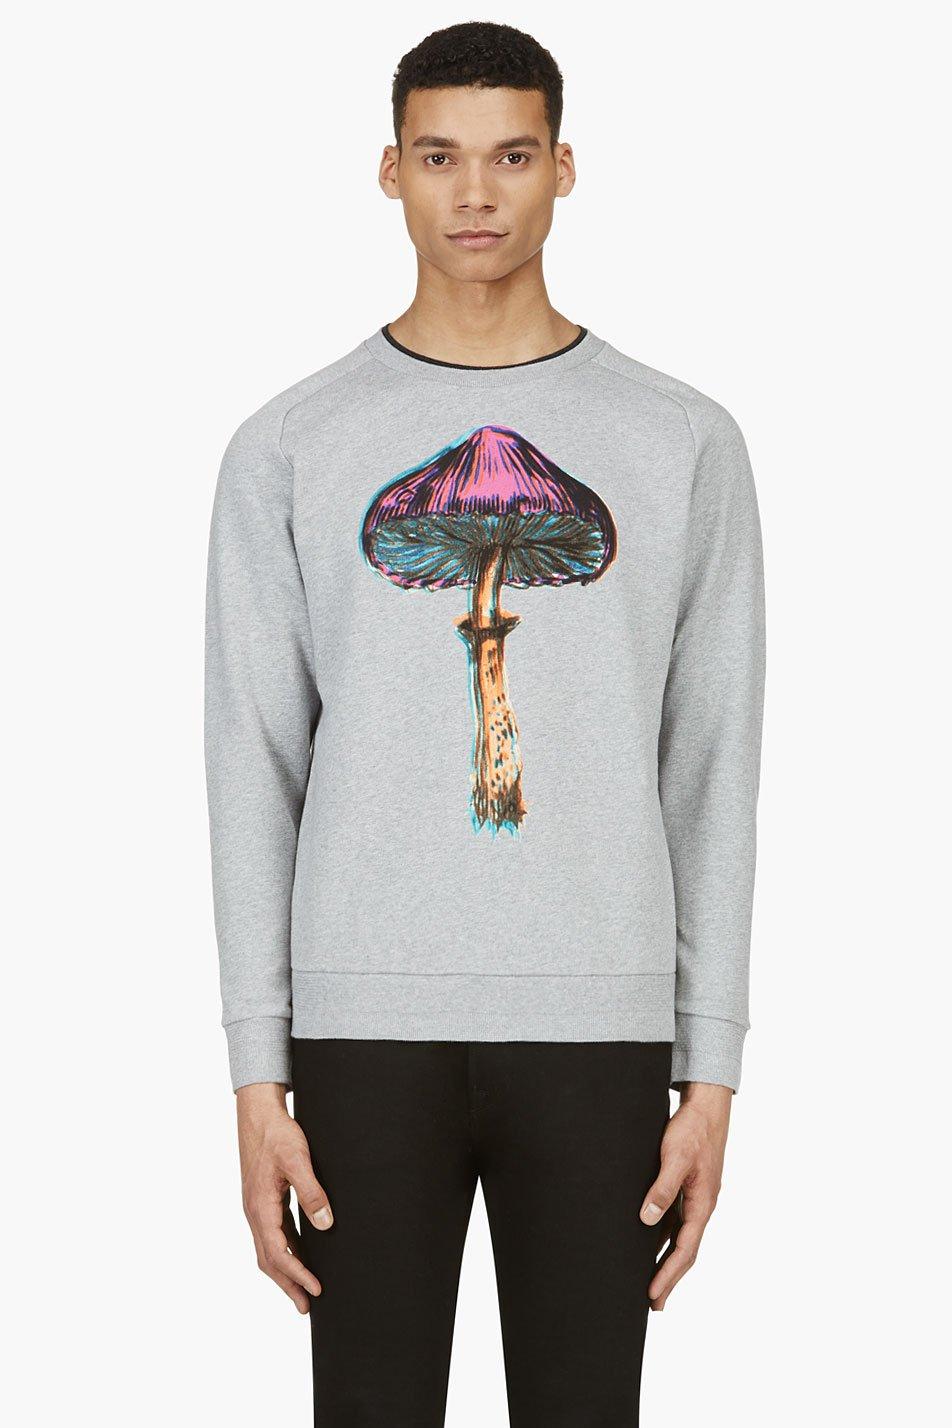 paul smith grey long sleeve mushroom print crewneck